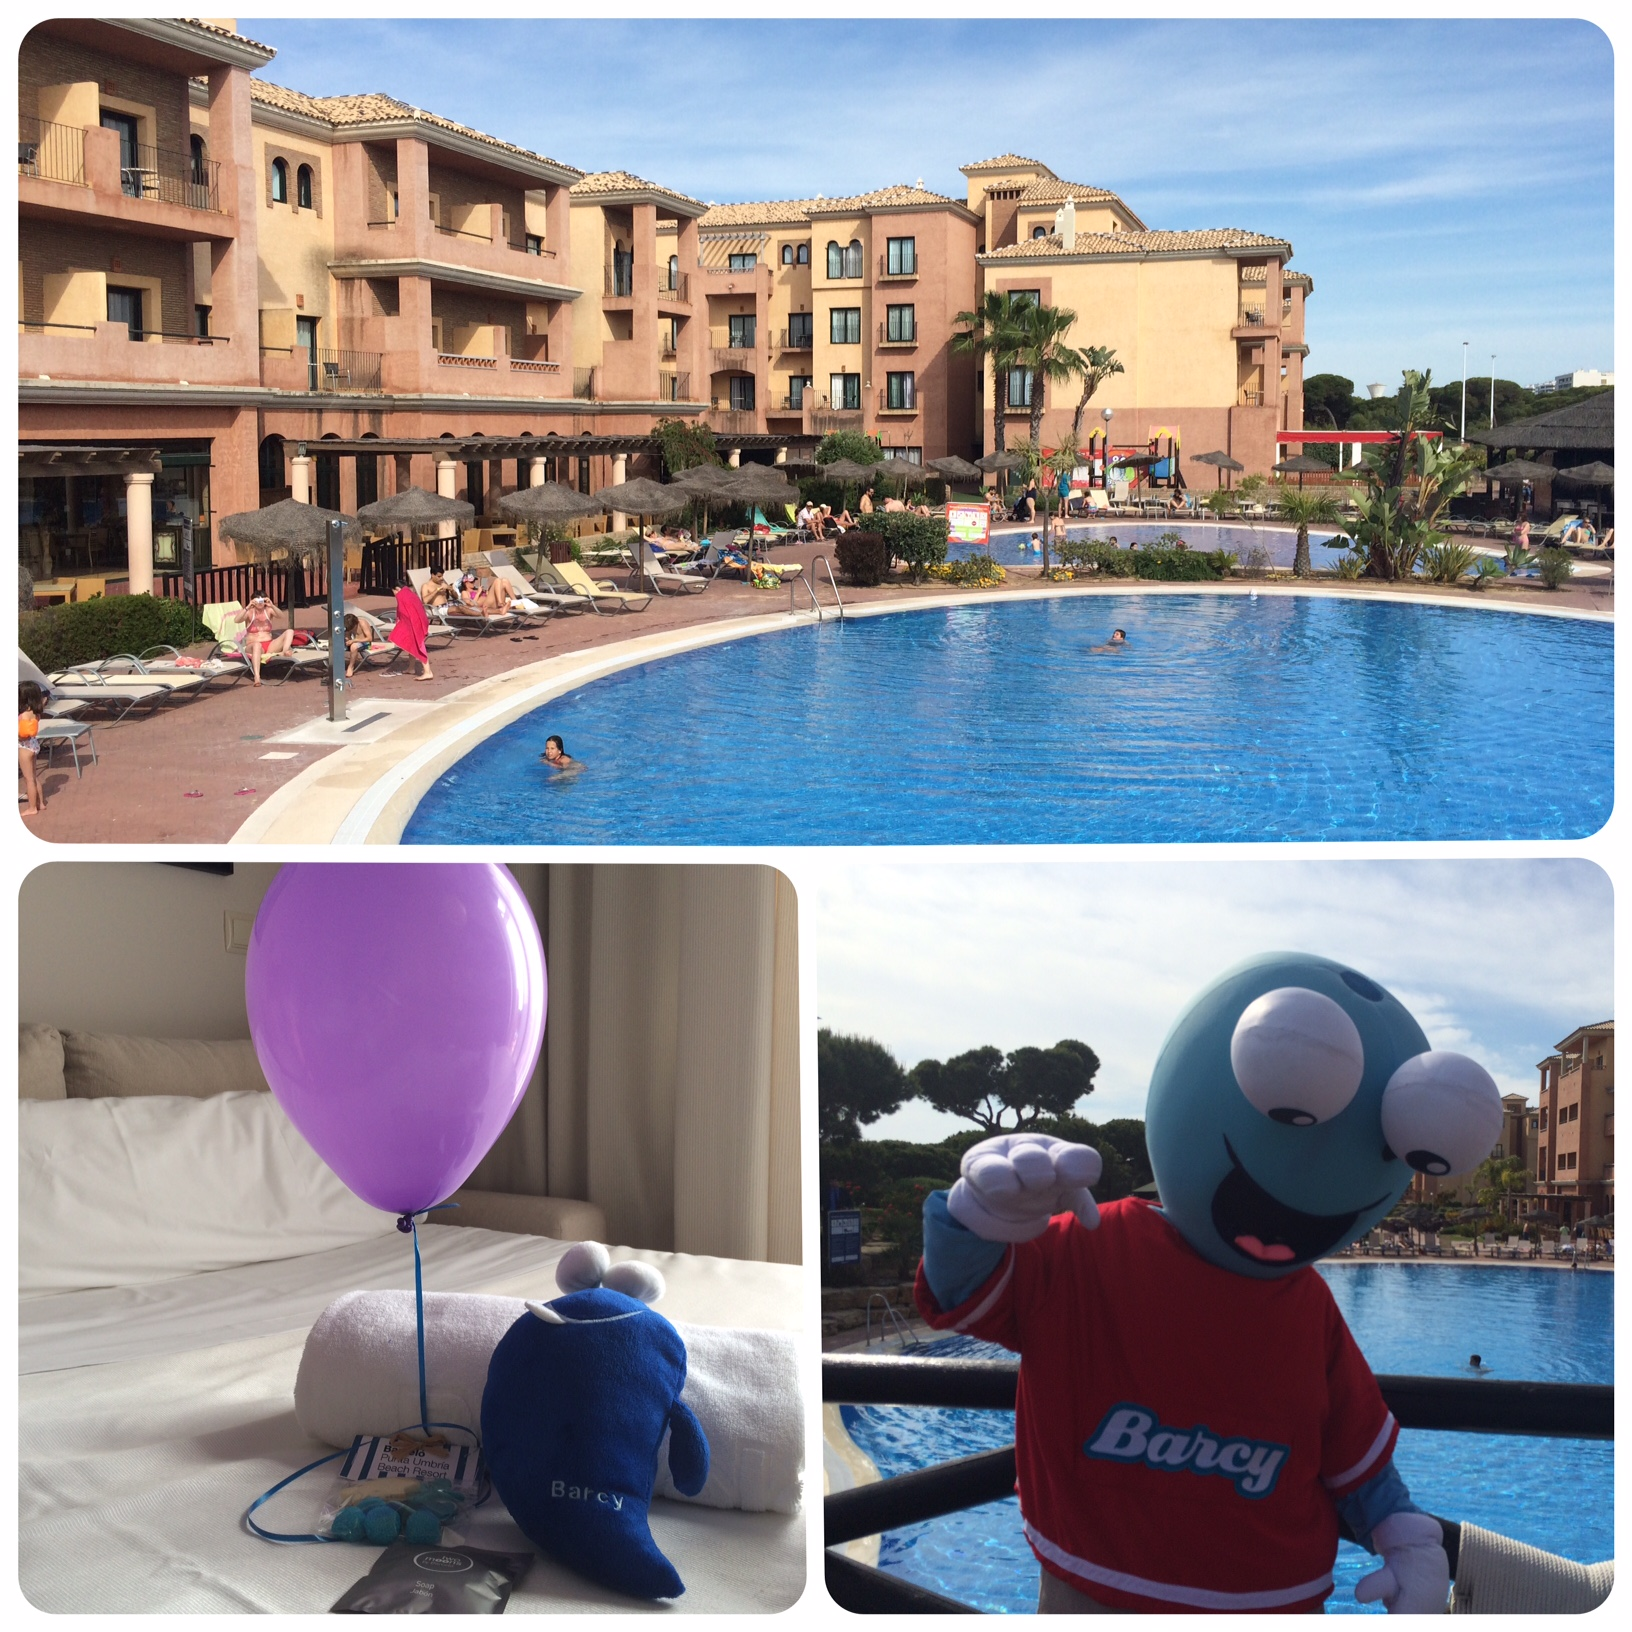 Hoteles para niños en Huelva: Barceló Punta Umbria Beach Resort-15324-joanasaldon